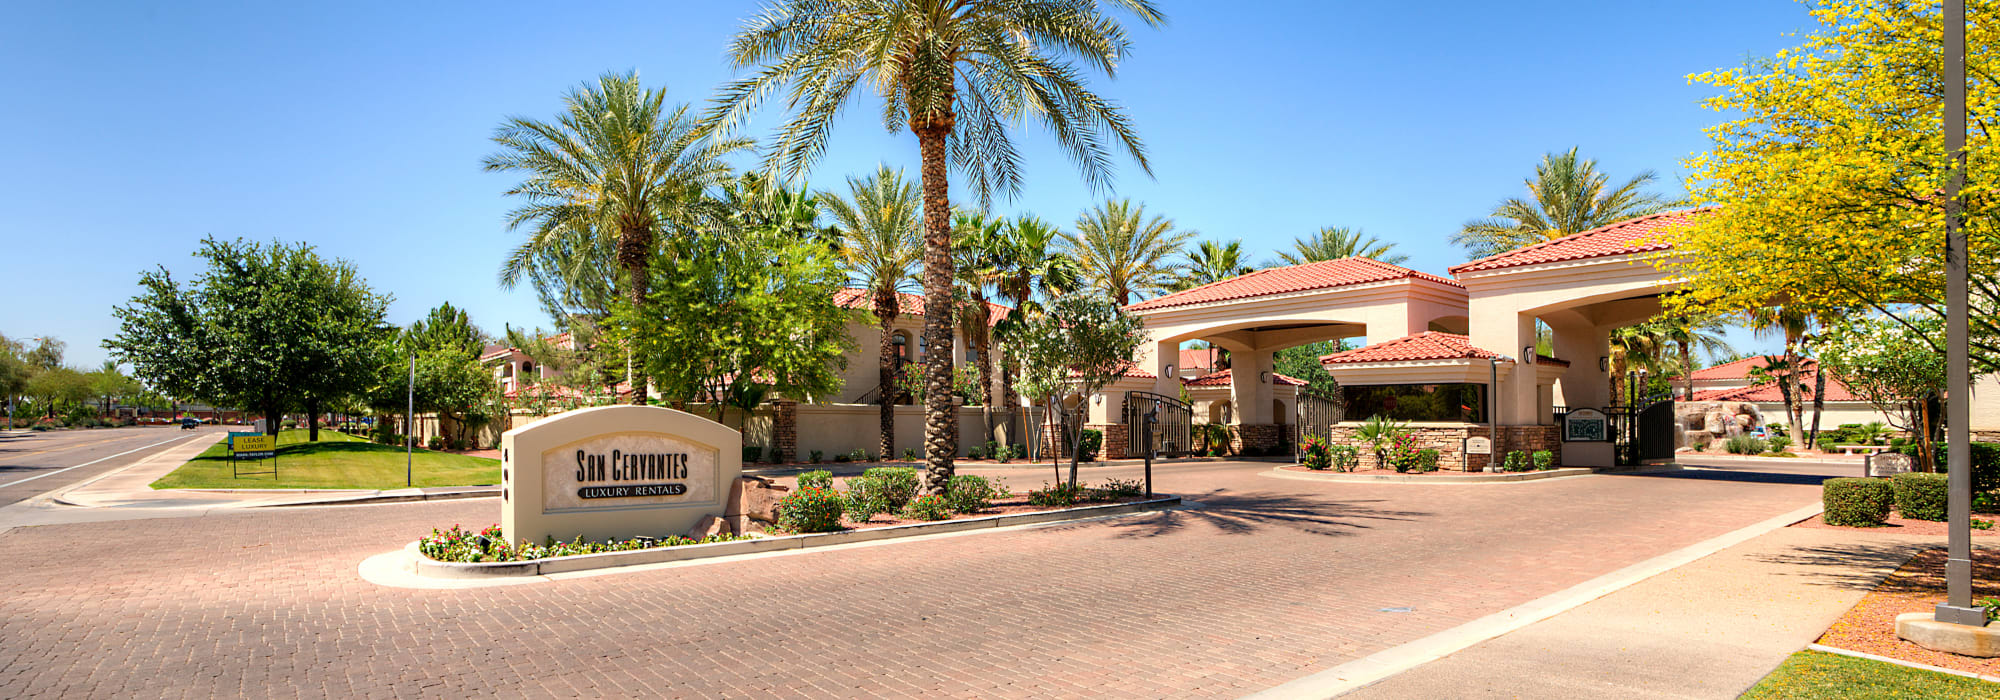 Entrance to San Cervantes in Chandler, Arizona